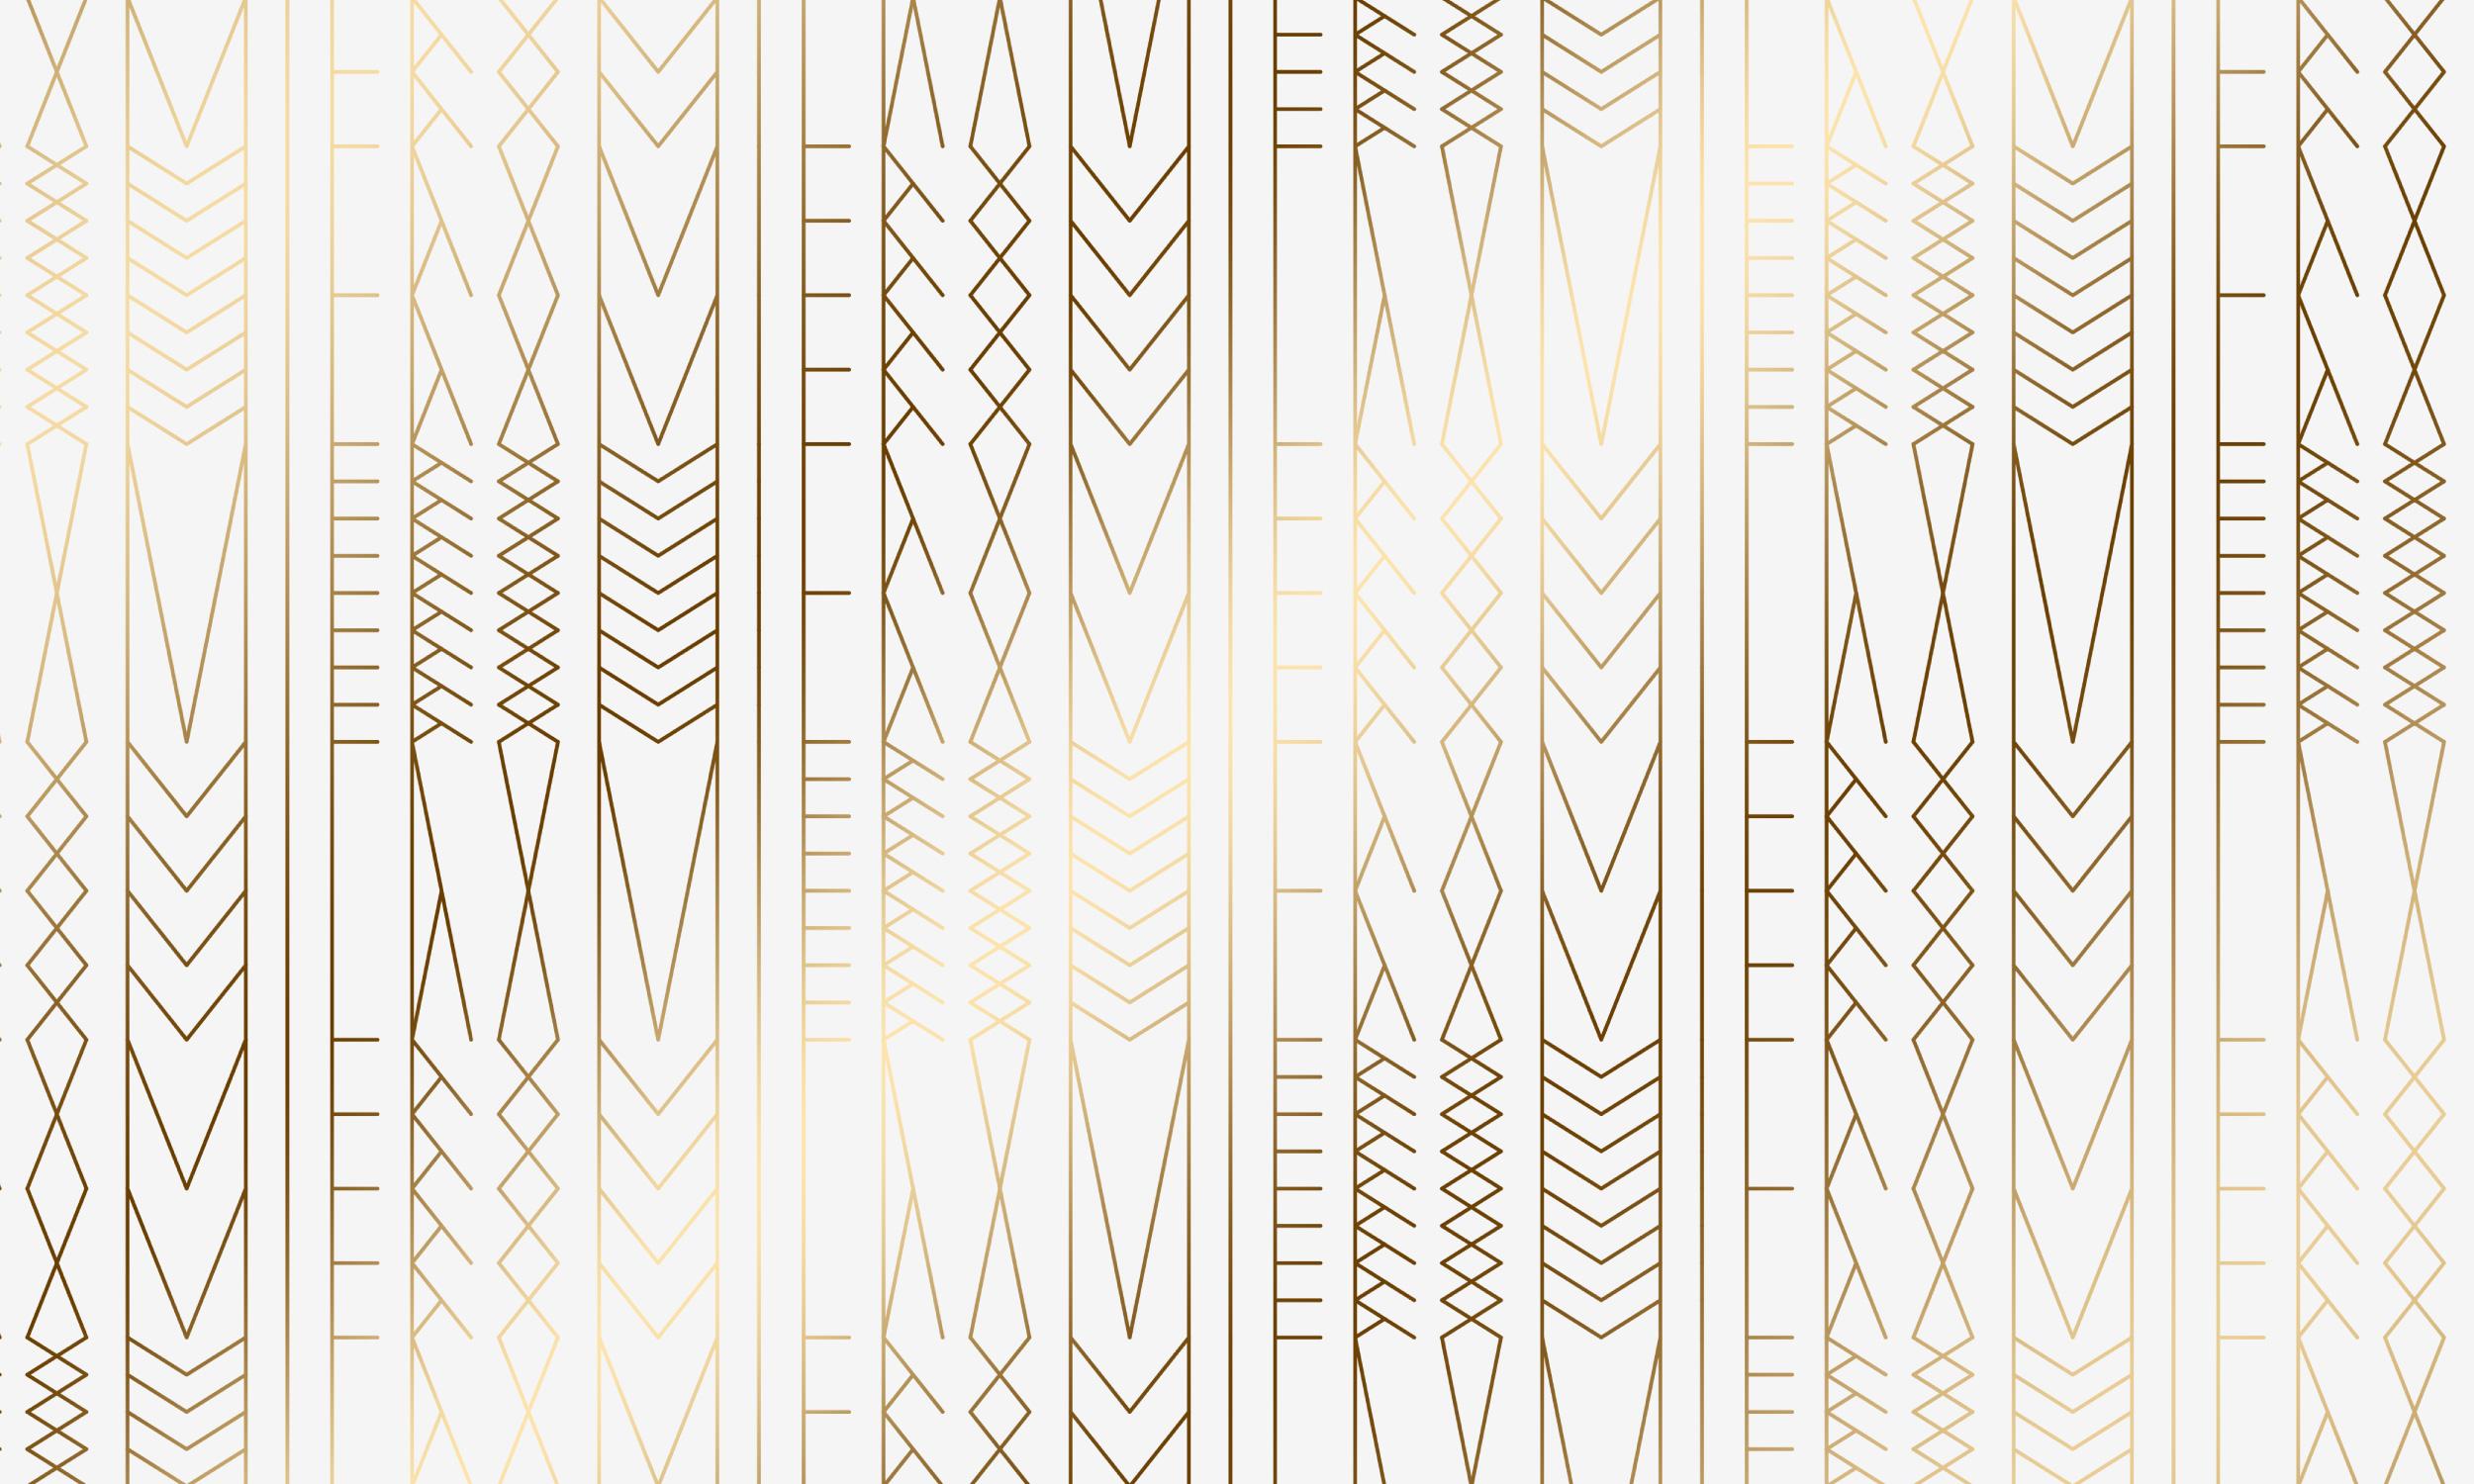 laxmi_pattern_3.jpg